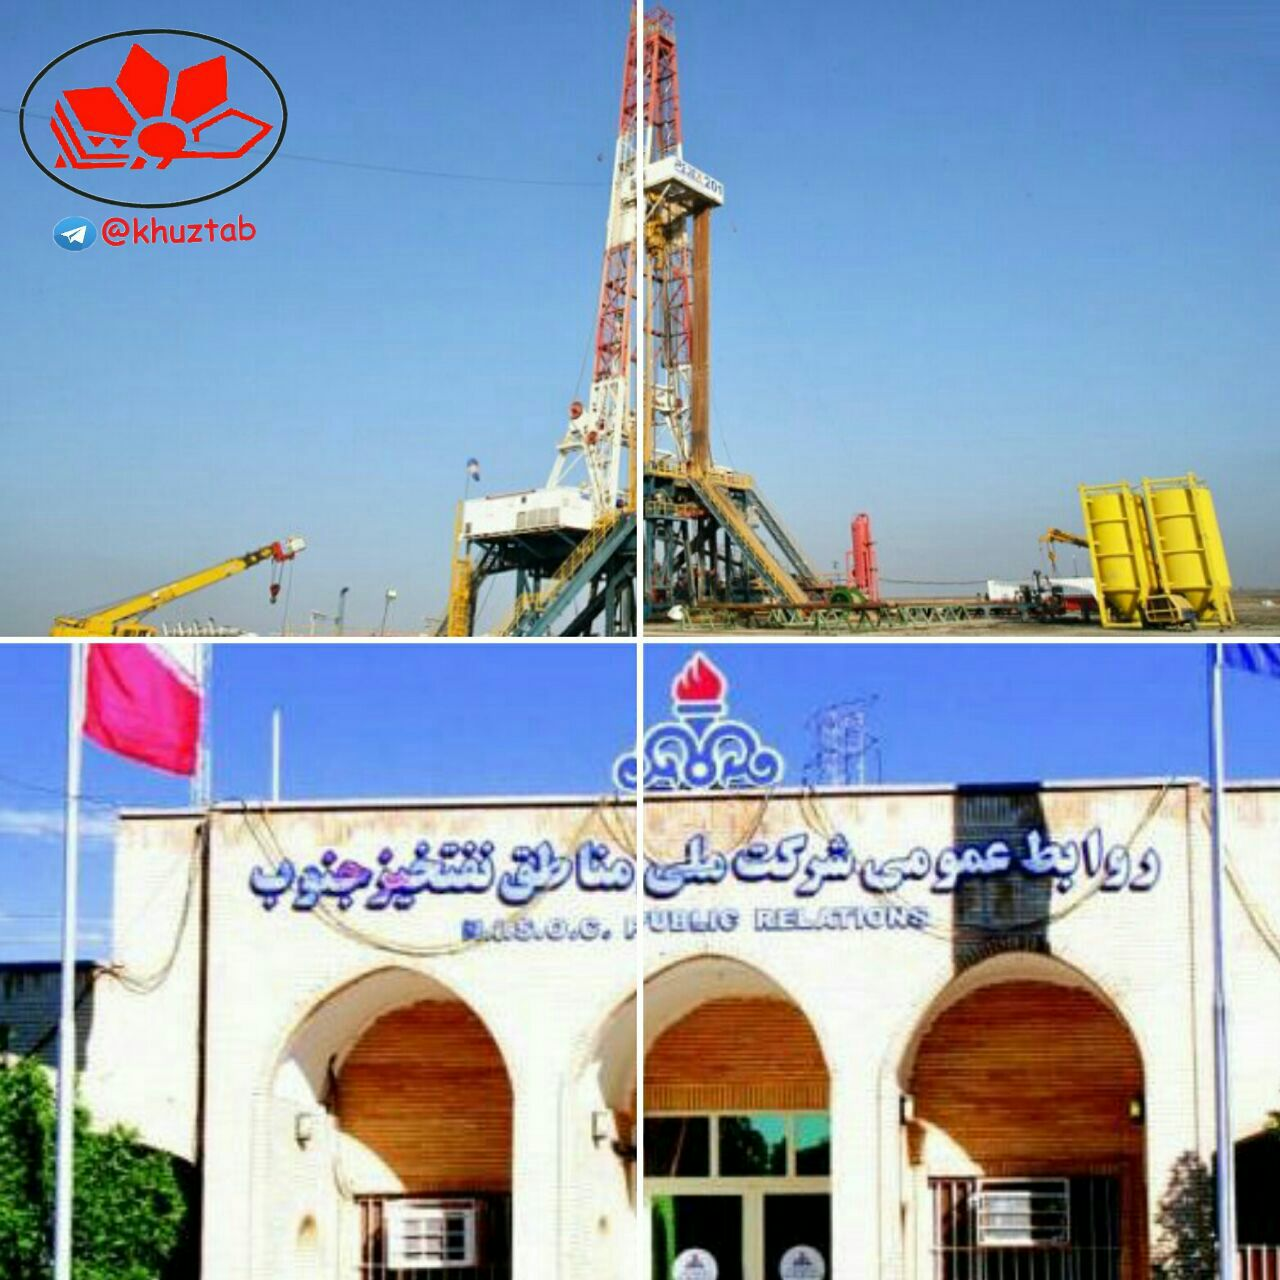 IMG 20190711 051512 365 مناطق نفت خیز جنوب و ملی حفاری ایران همکاری می کنند